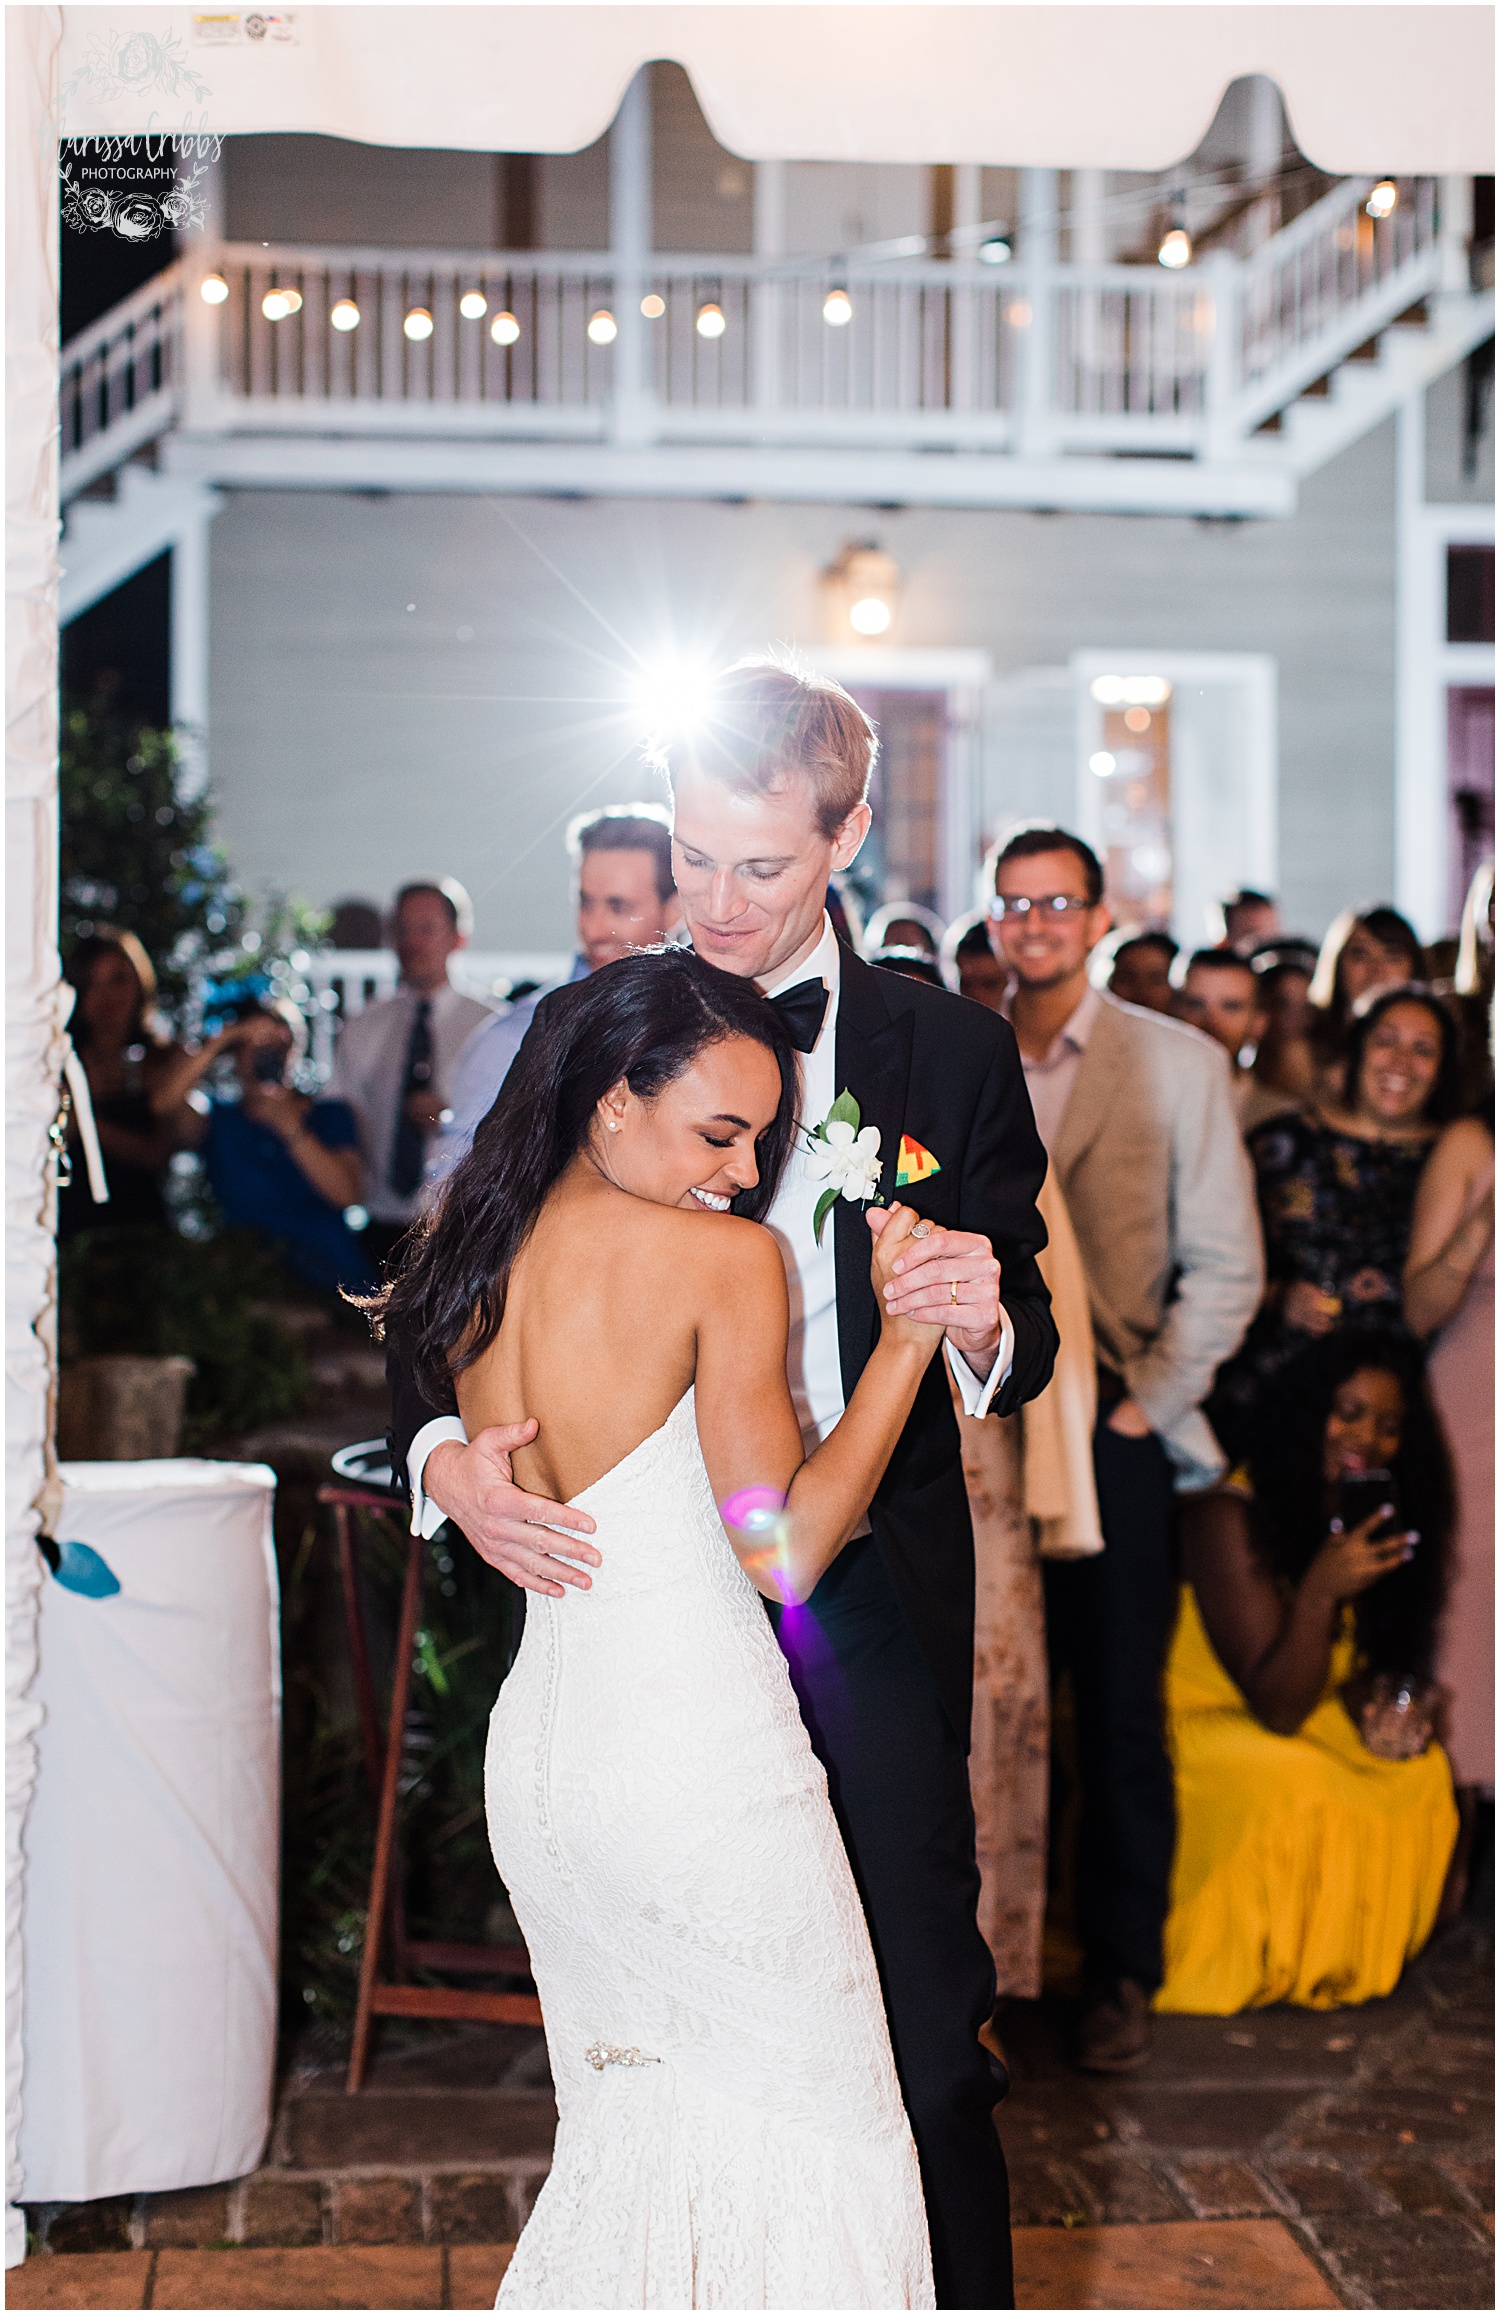 NEW ORLEANS WEDDING   BENACHI HOUSE   SARAH & MICHAEL   MARISSA CRIBBS PHOTOGRAPHY_4508.jpg